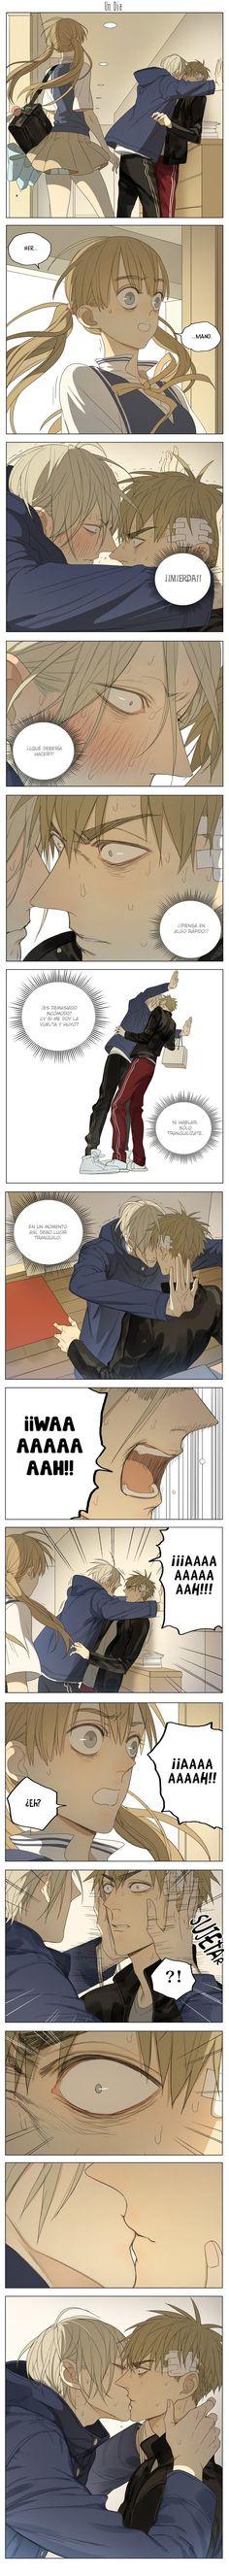 19 Days Capítulo 11 página 12 - Leer Manga en Español gratis en NineManga.com